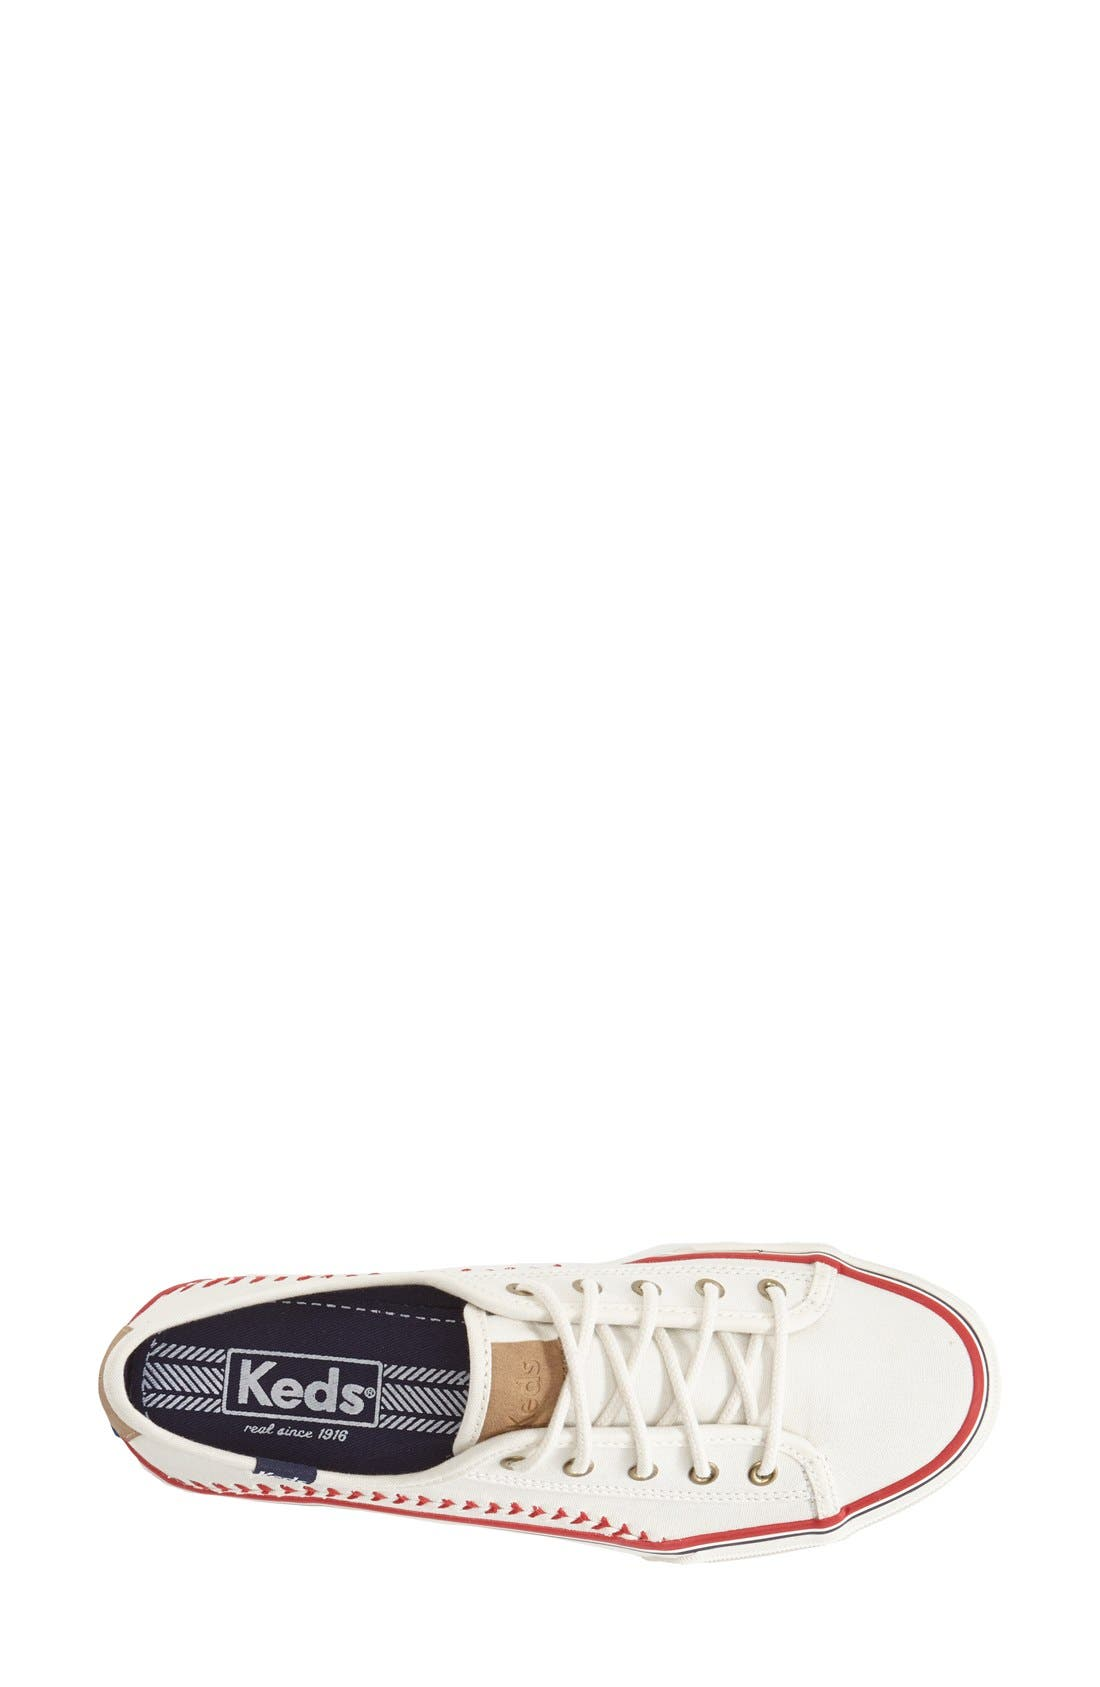 Alternate Image 3  - Keds® 'Champion - Double Take' Sneaker (Women)